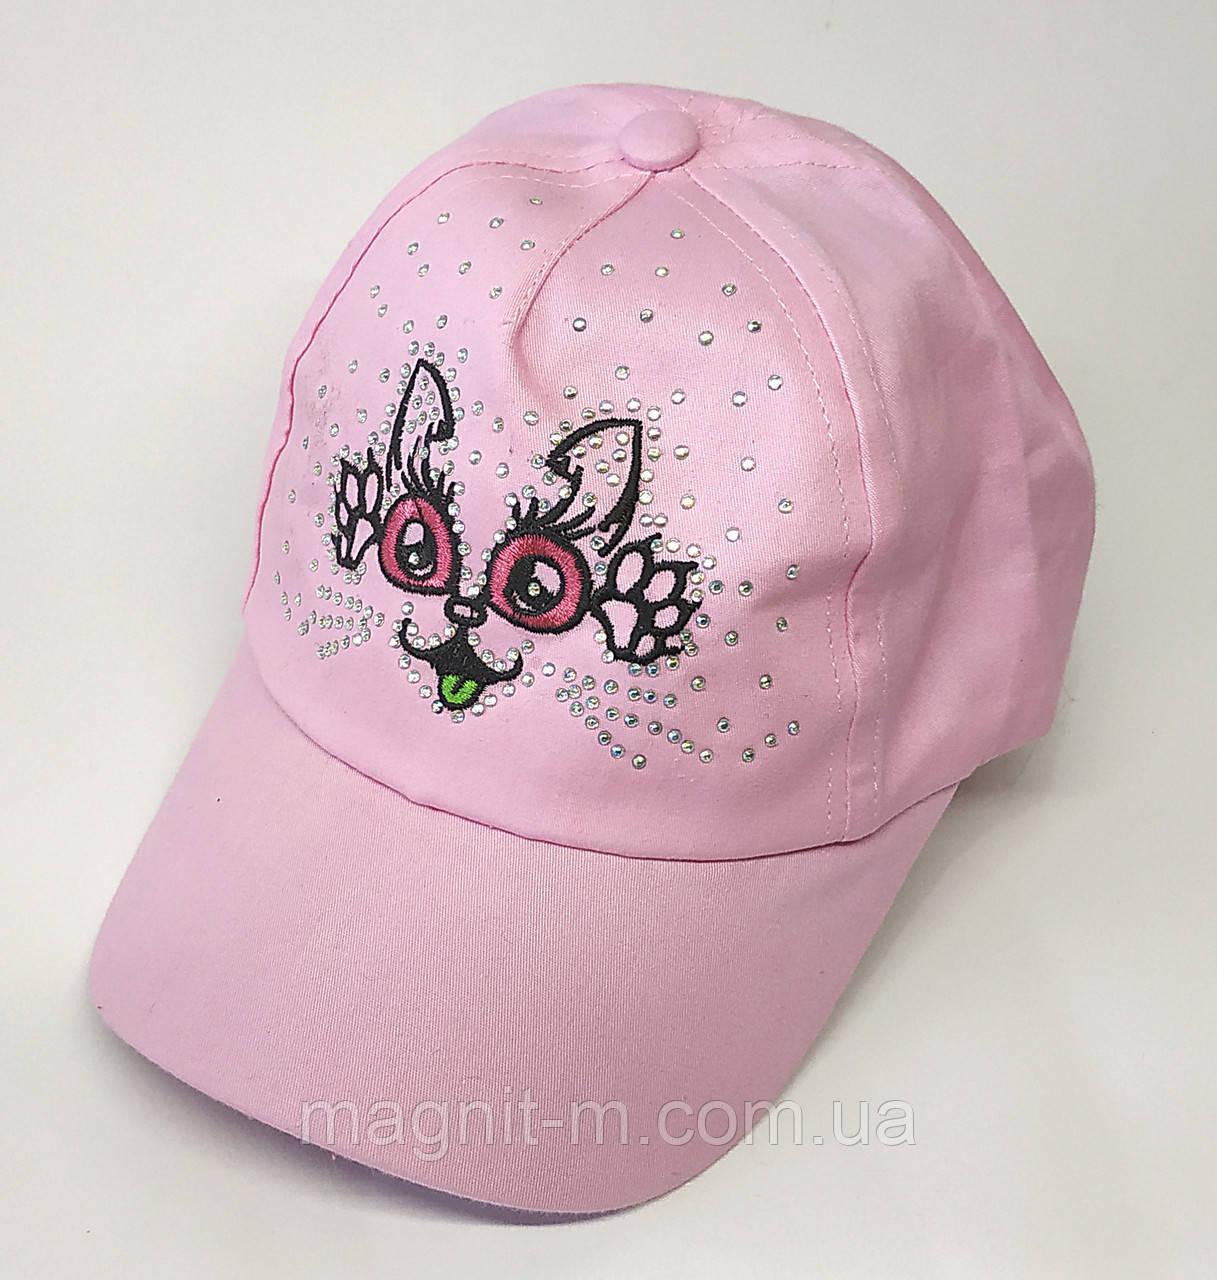 "Кепка для девочки ""Кошечка со стразами"". 3-4 года. Нежно-розового цвета."